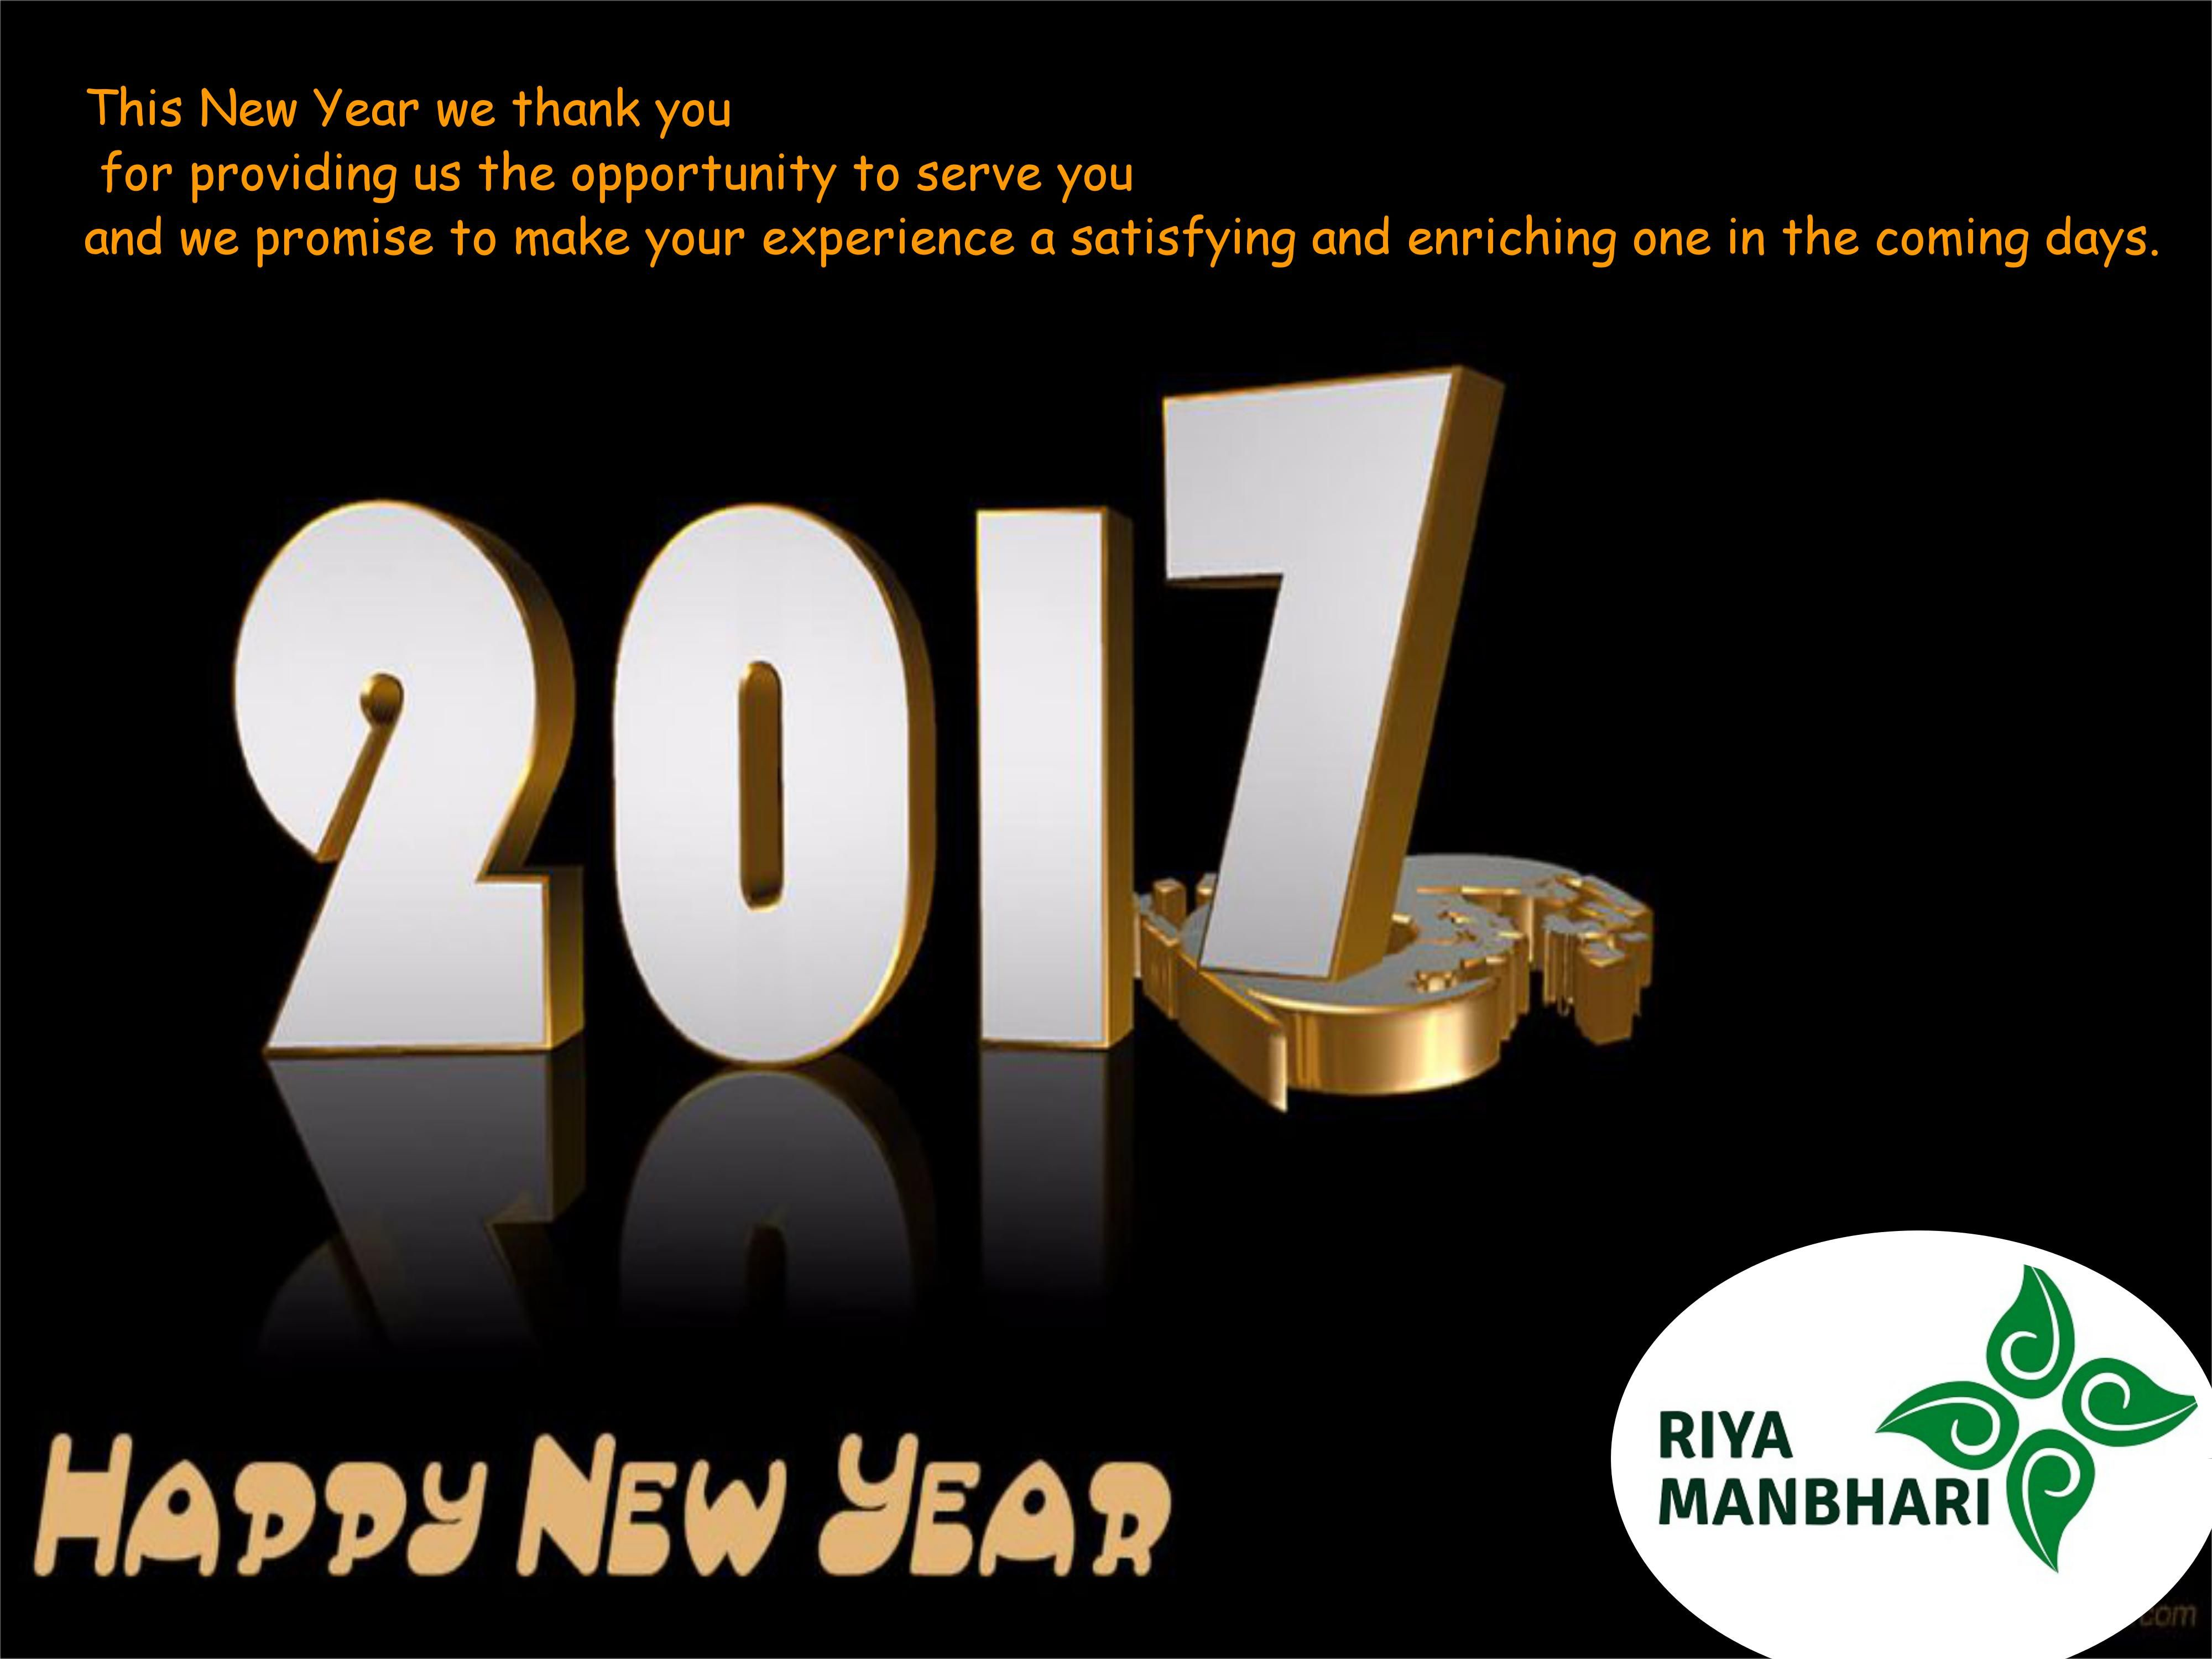 Imgenes de happy chinese new year wishes messages 2011 wishes messages new year wallpaper chinese new years happy new year message m4hsunfo